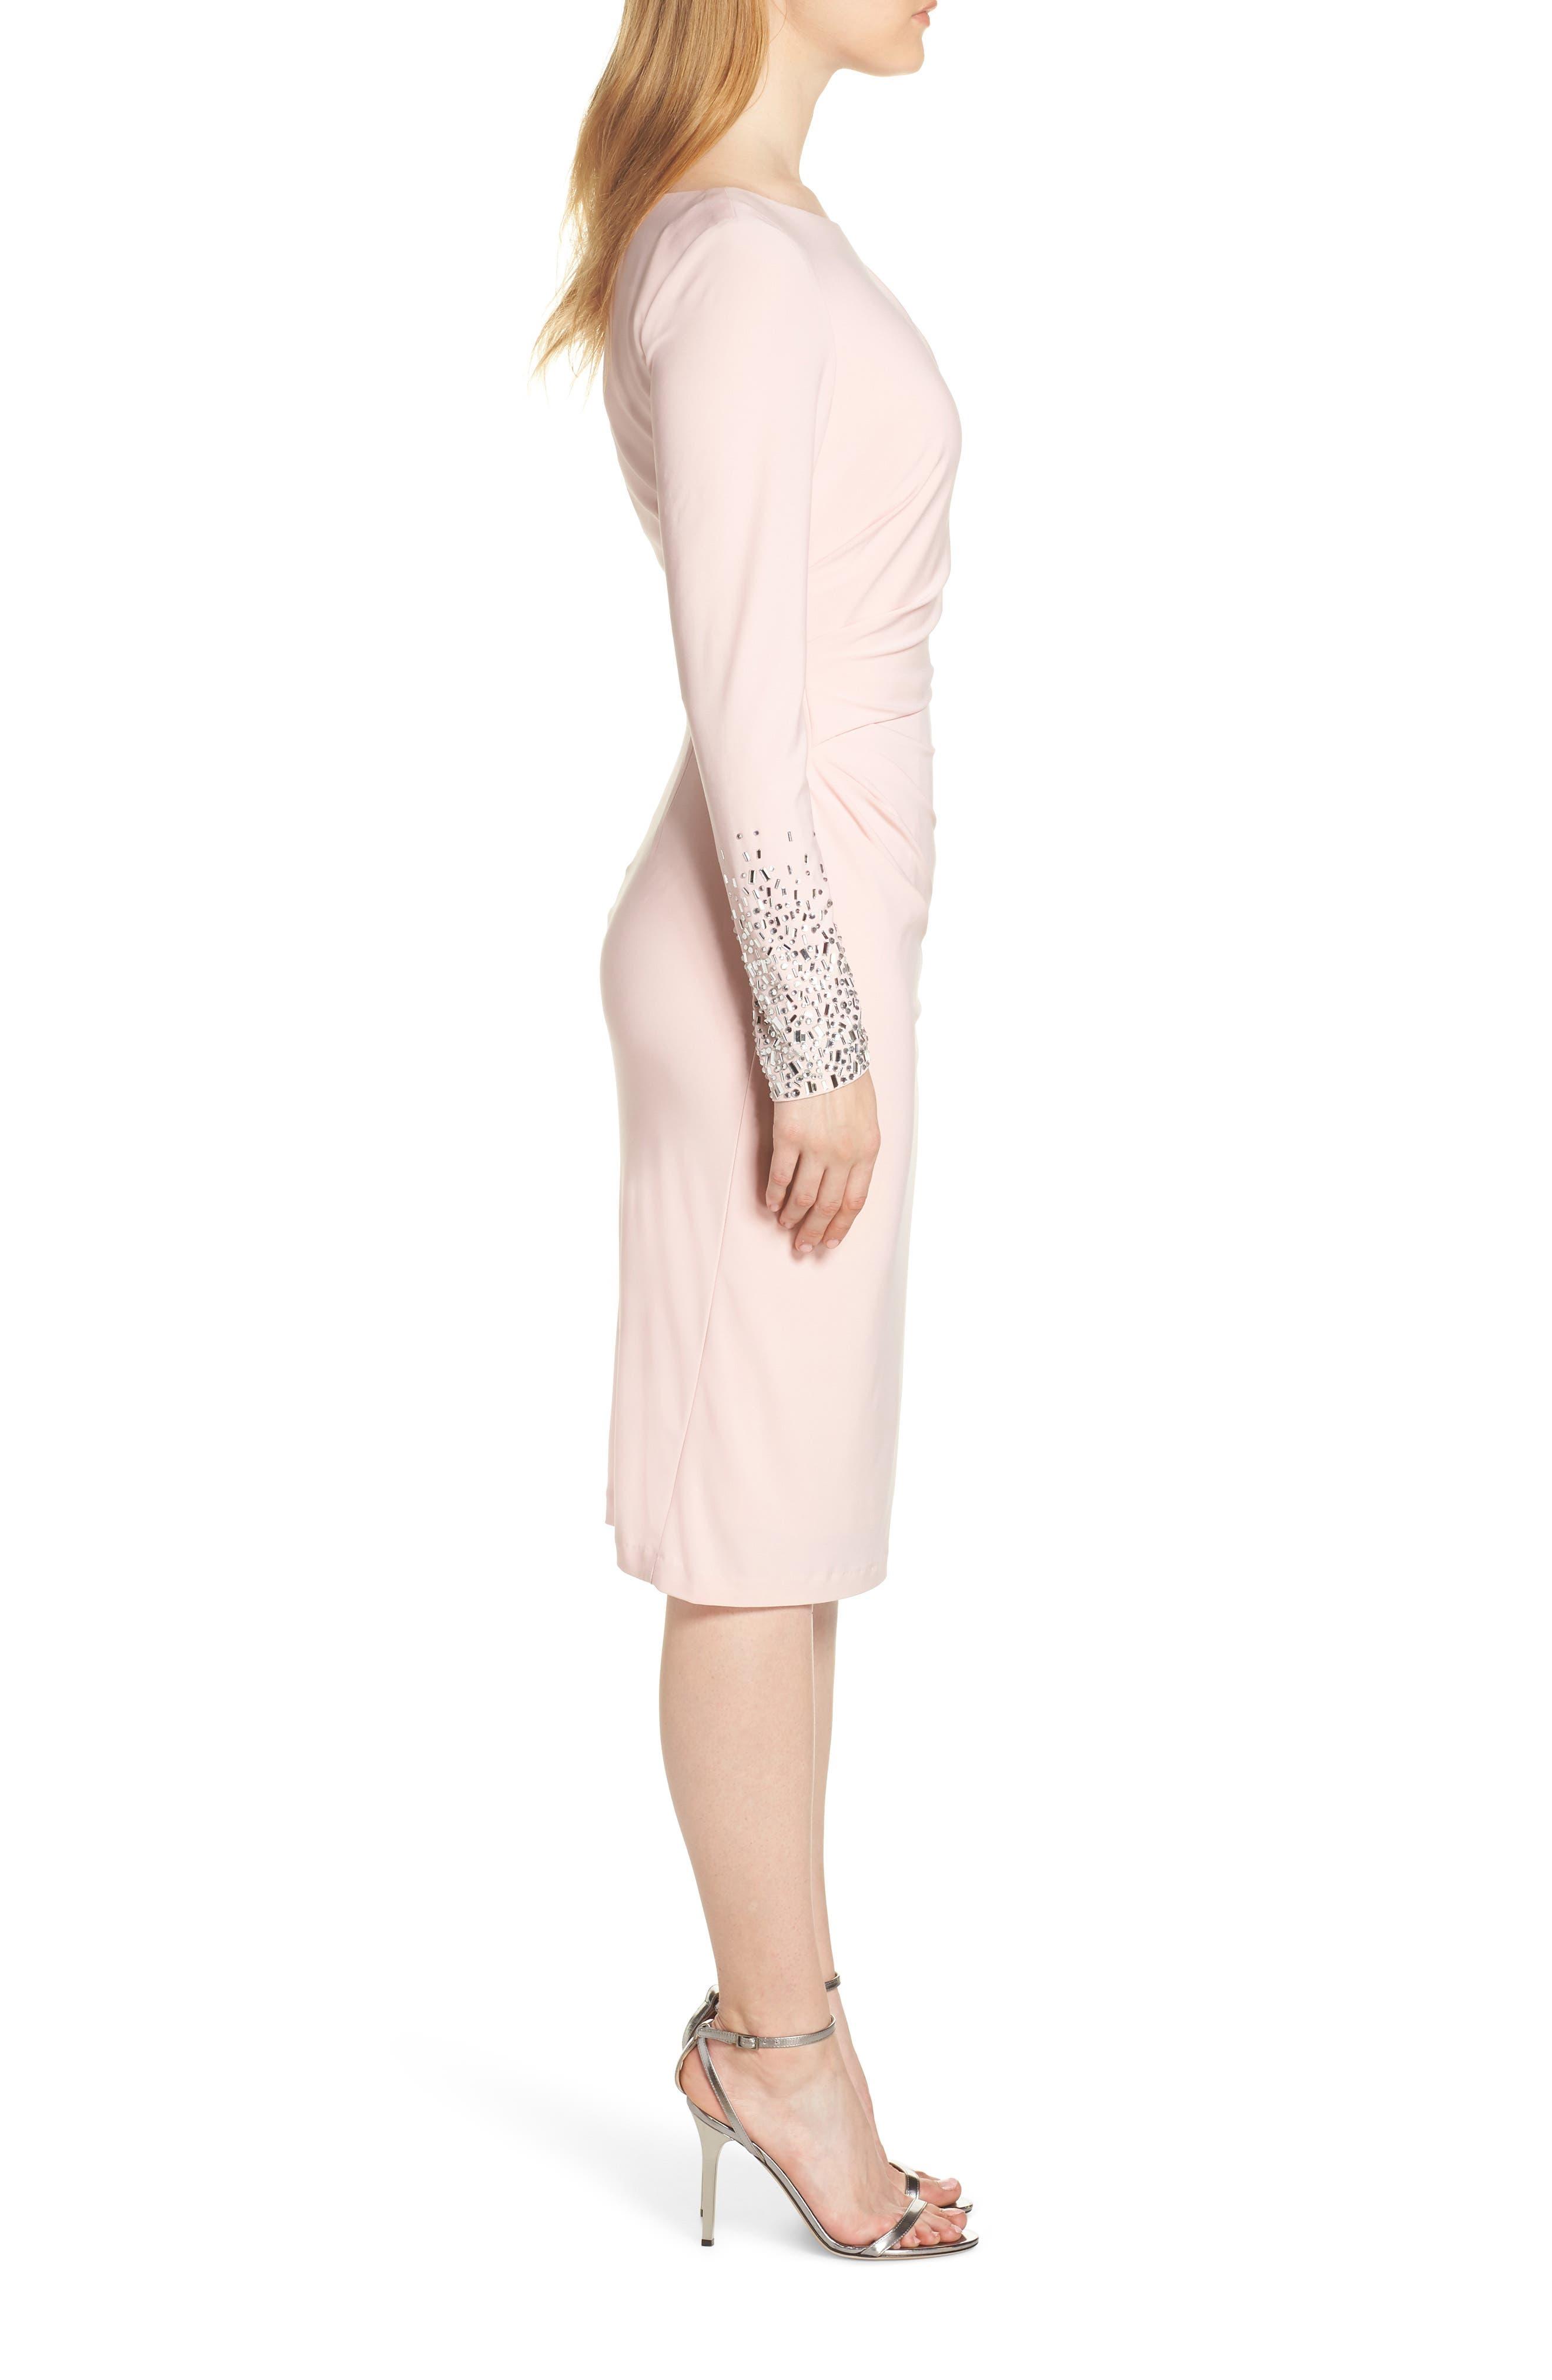 VINCE CAMUTO, Long Sleeve Bateau Neck Cocktail Dress, Alternate thumbnail 4, color, BLUSH